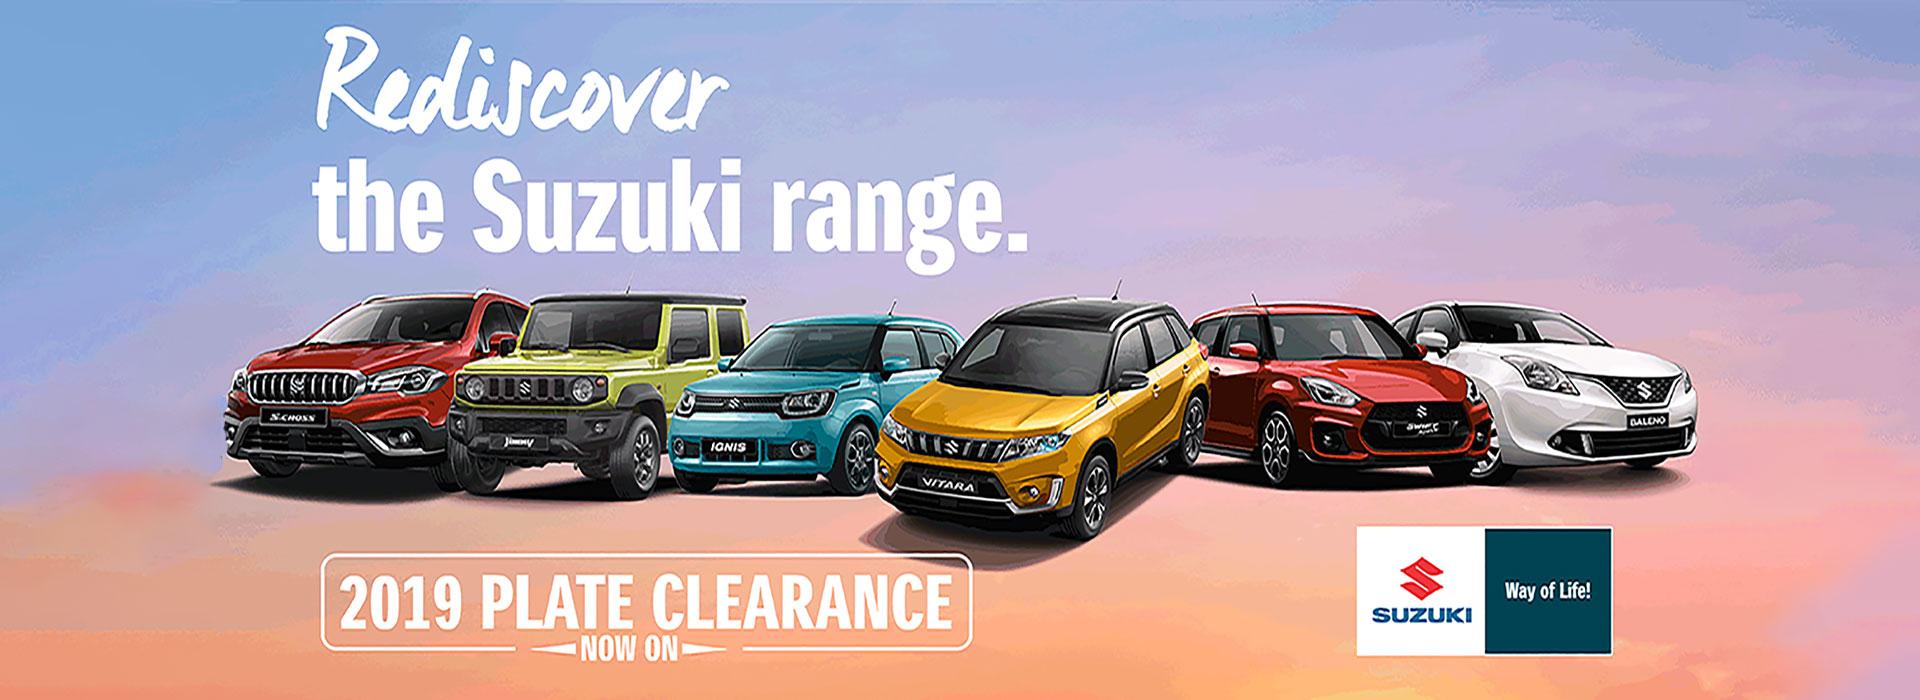 Suzuki QLD - 2019 Plate Clearance